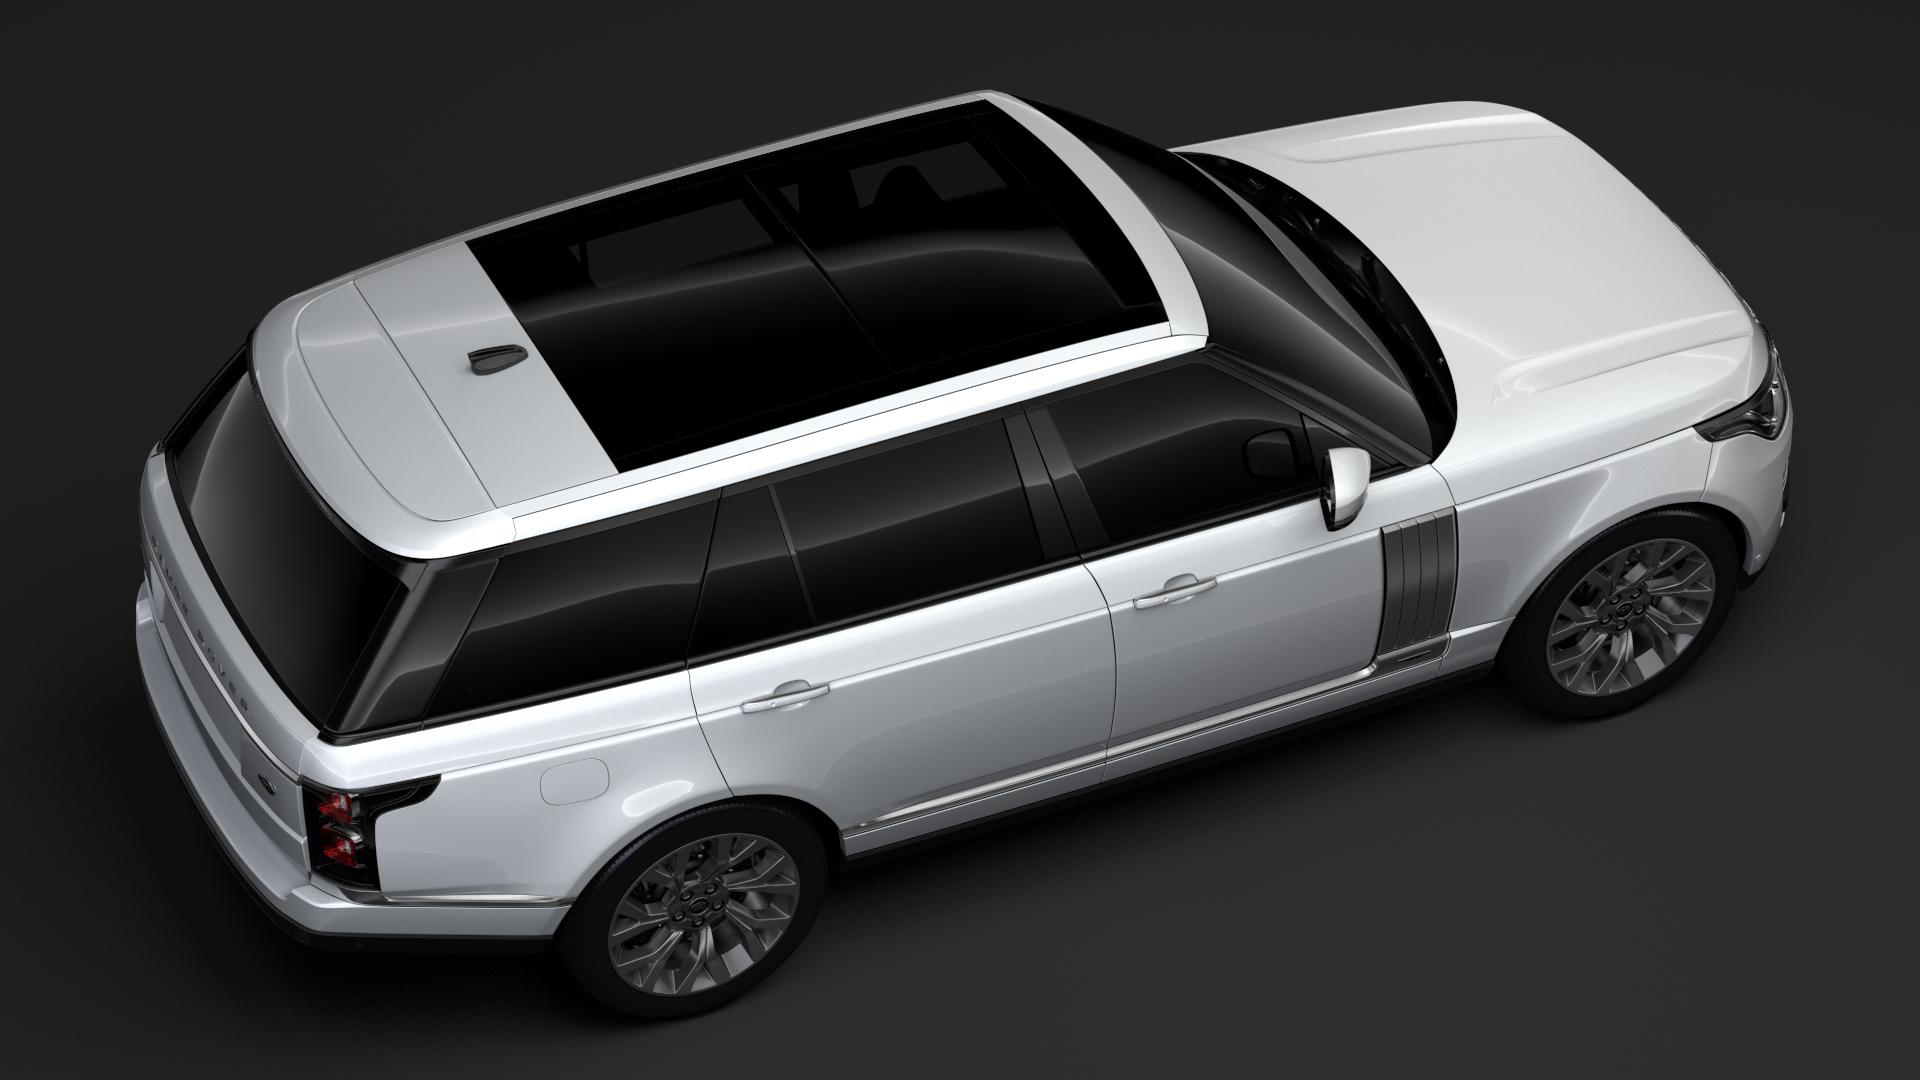 range rover autobiography p400e lwb l405 2018 3d model fbx c4d lwo ma mb hrc xsi obj 277364